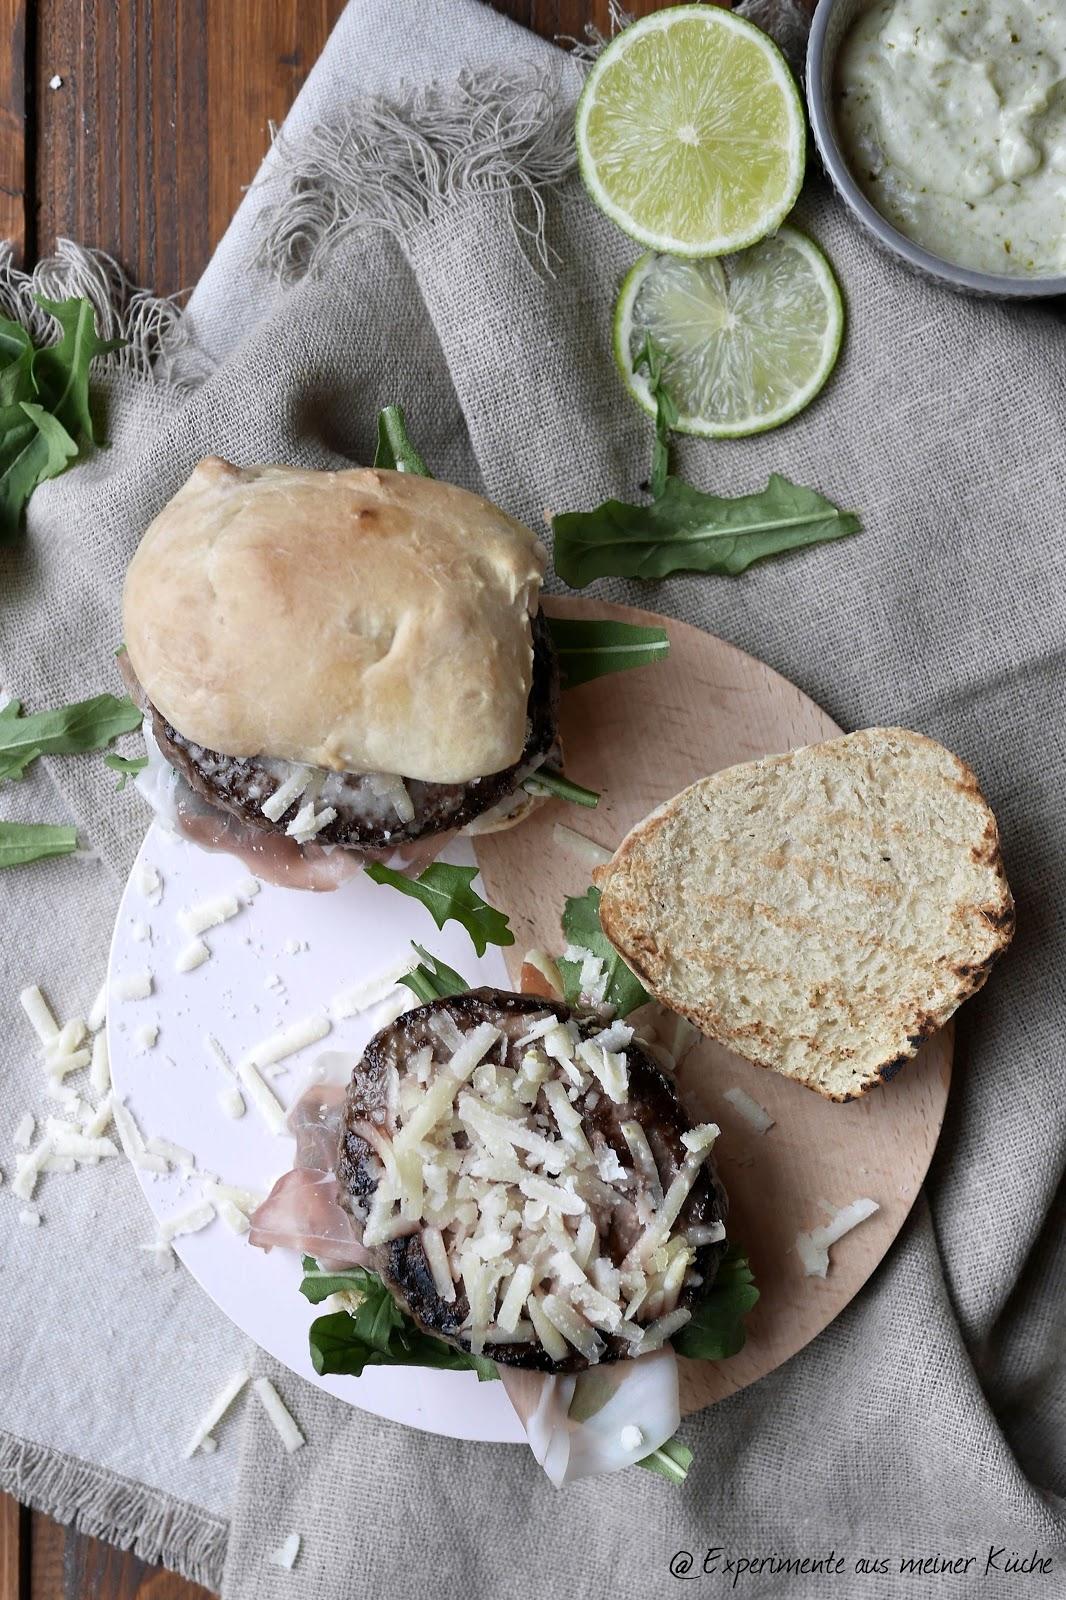 experimente aus meiner k che ciabatta wagyu burger mit pesto limetten mayo. Black Bedroom Furniture Sets. Home Design Ideas